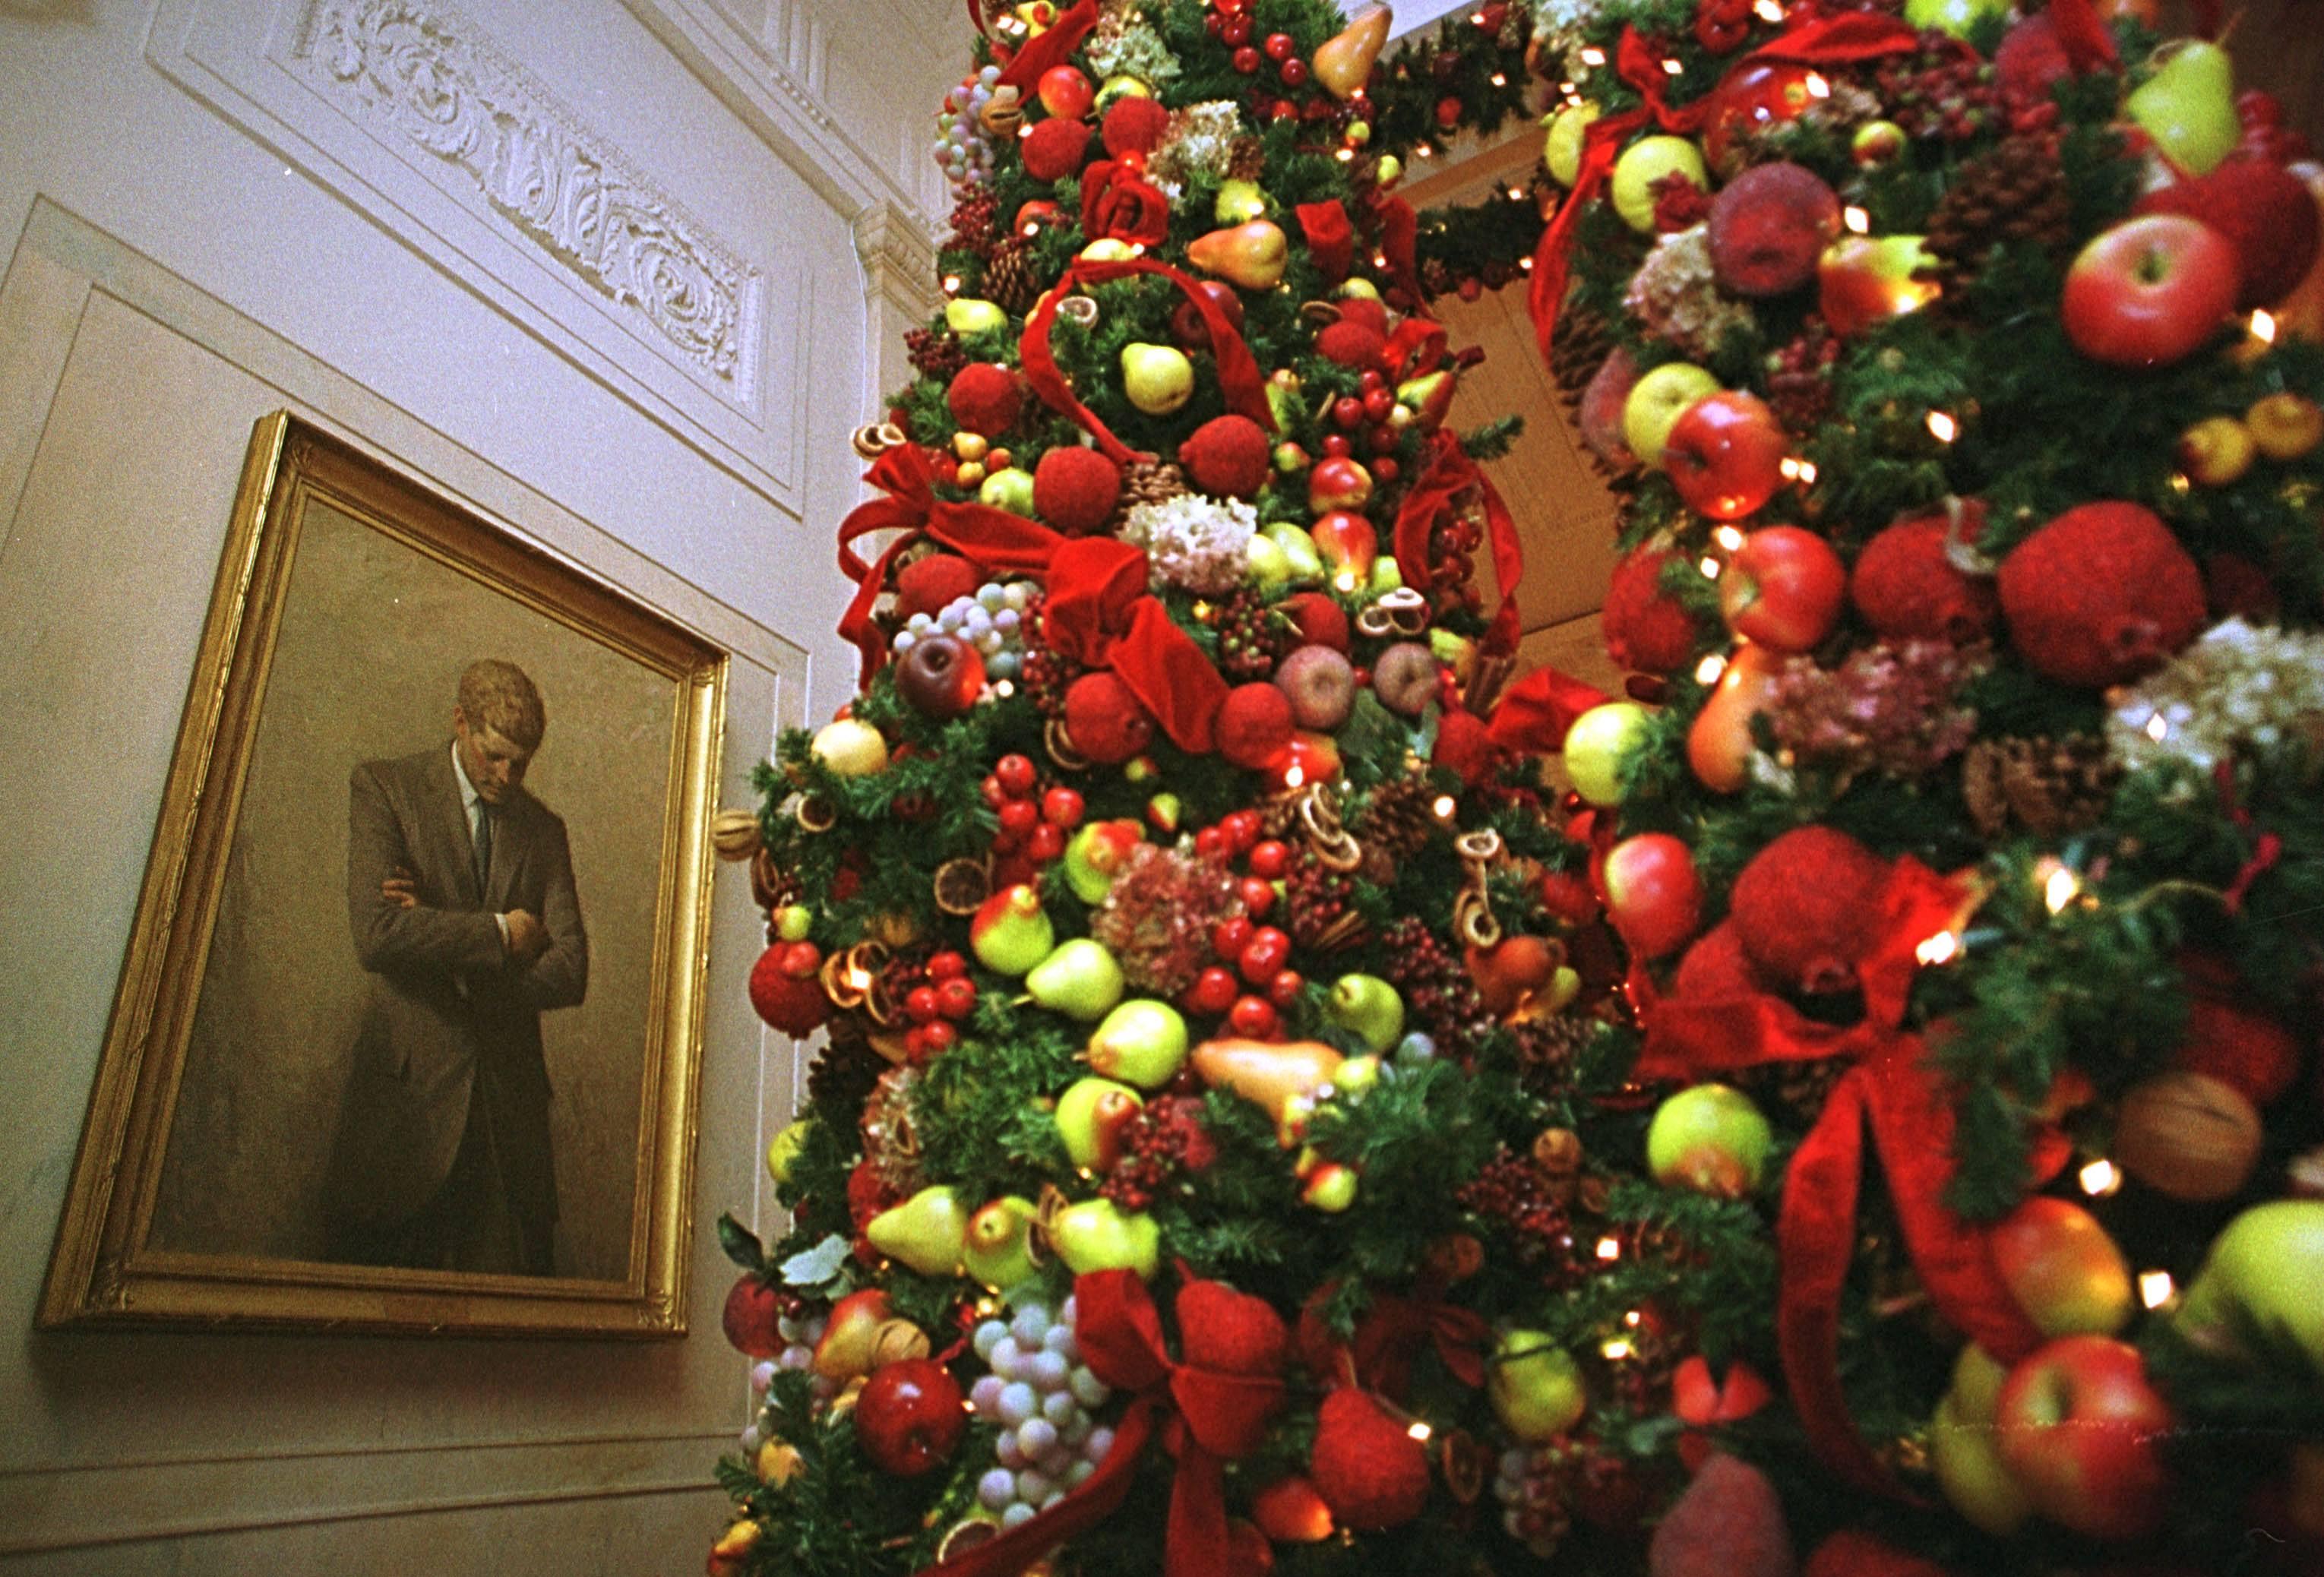 clinton's christmas decorations